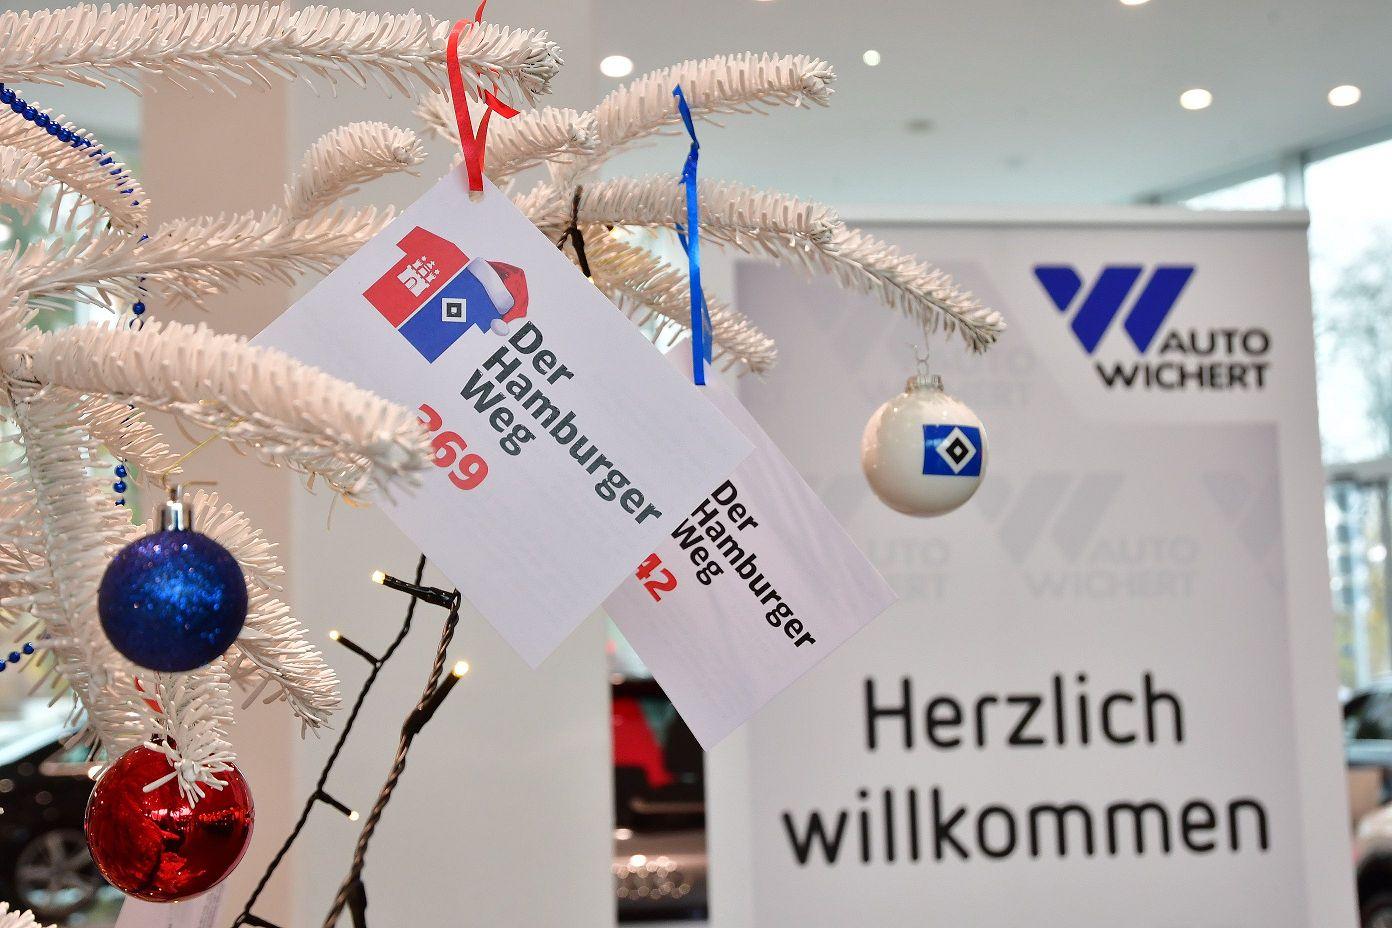 AW Hamburger Weg Audi 2017Auto Wichert (c) Martin BrinkmannBRI_3060 (2)